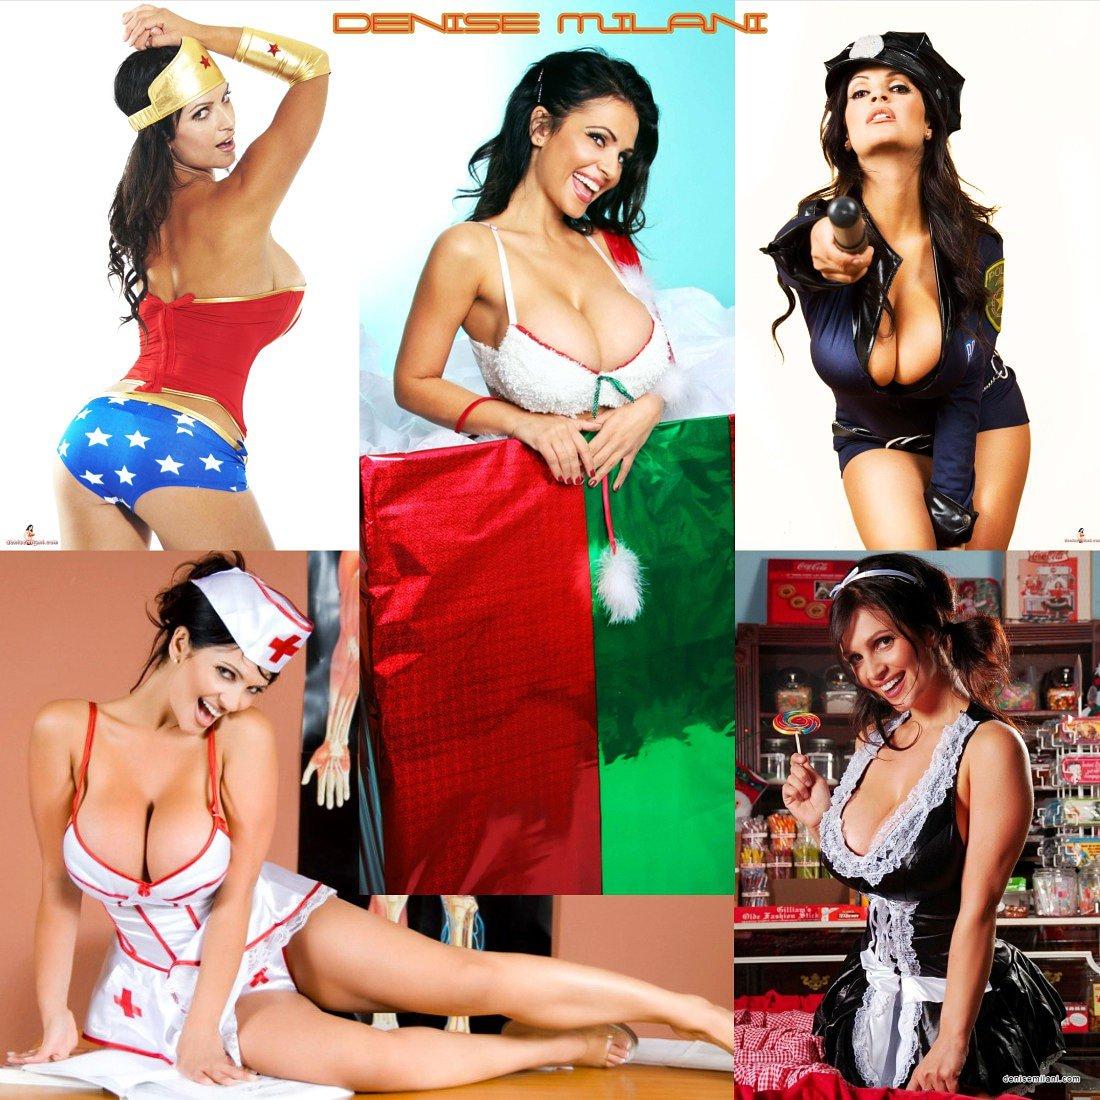 Homemade pics of women nude